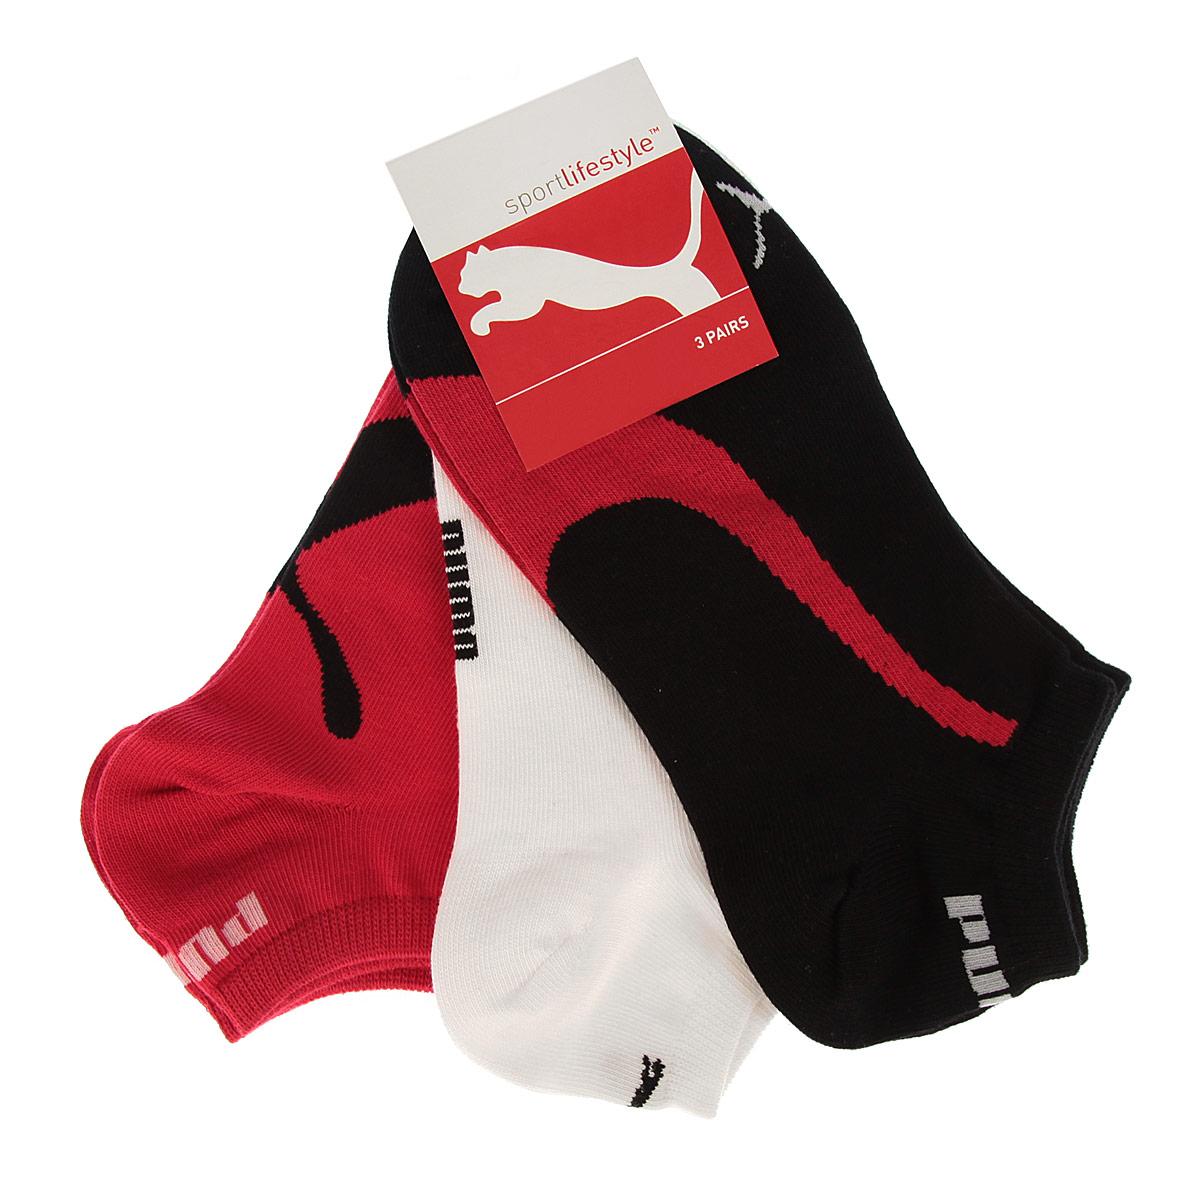 ����� ������� Lifestyle Sneakers, 3 ���� - Puma88641201����� Puma Lifestyle Sneakers � ����������� ���������� ����������� �� ������ � ����������� ��������� � ��������. ���������� ������� ������� �� ���������� � �������� ����. � �������� ������ ��� ���� ������, ����������� ��������� ��������� ������.